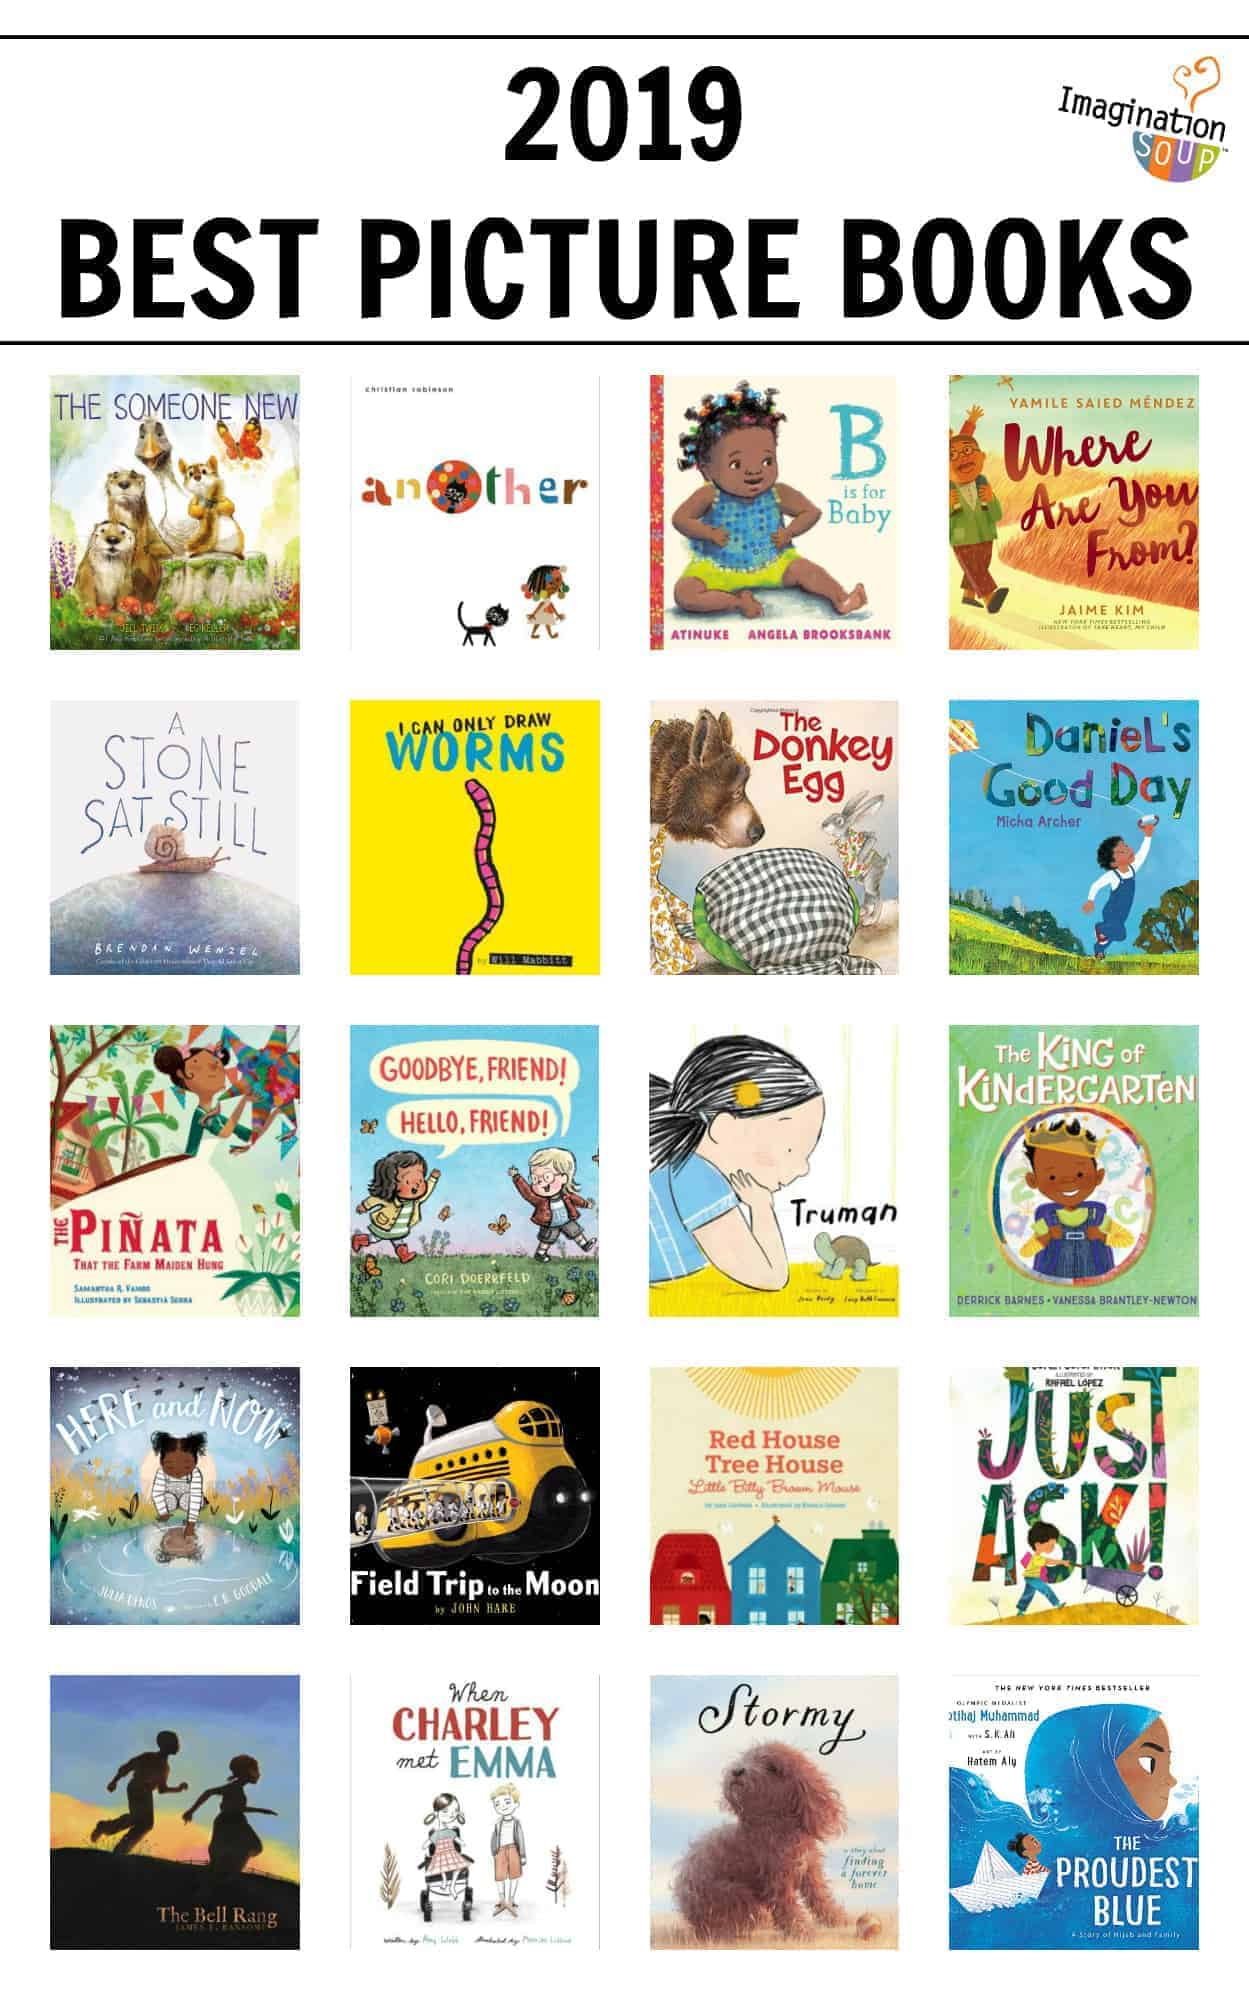 Best Children's Picture Books 2019